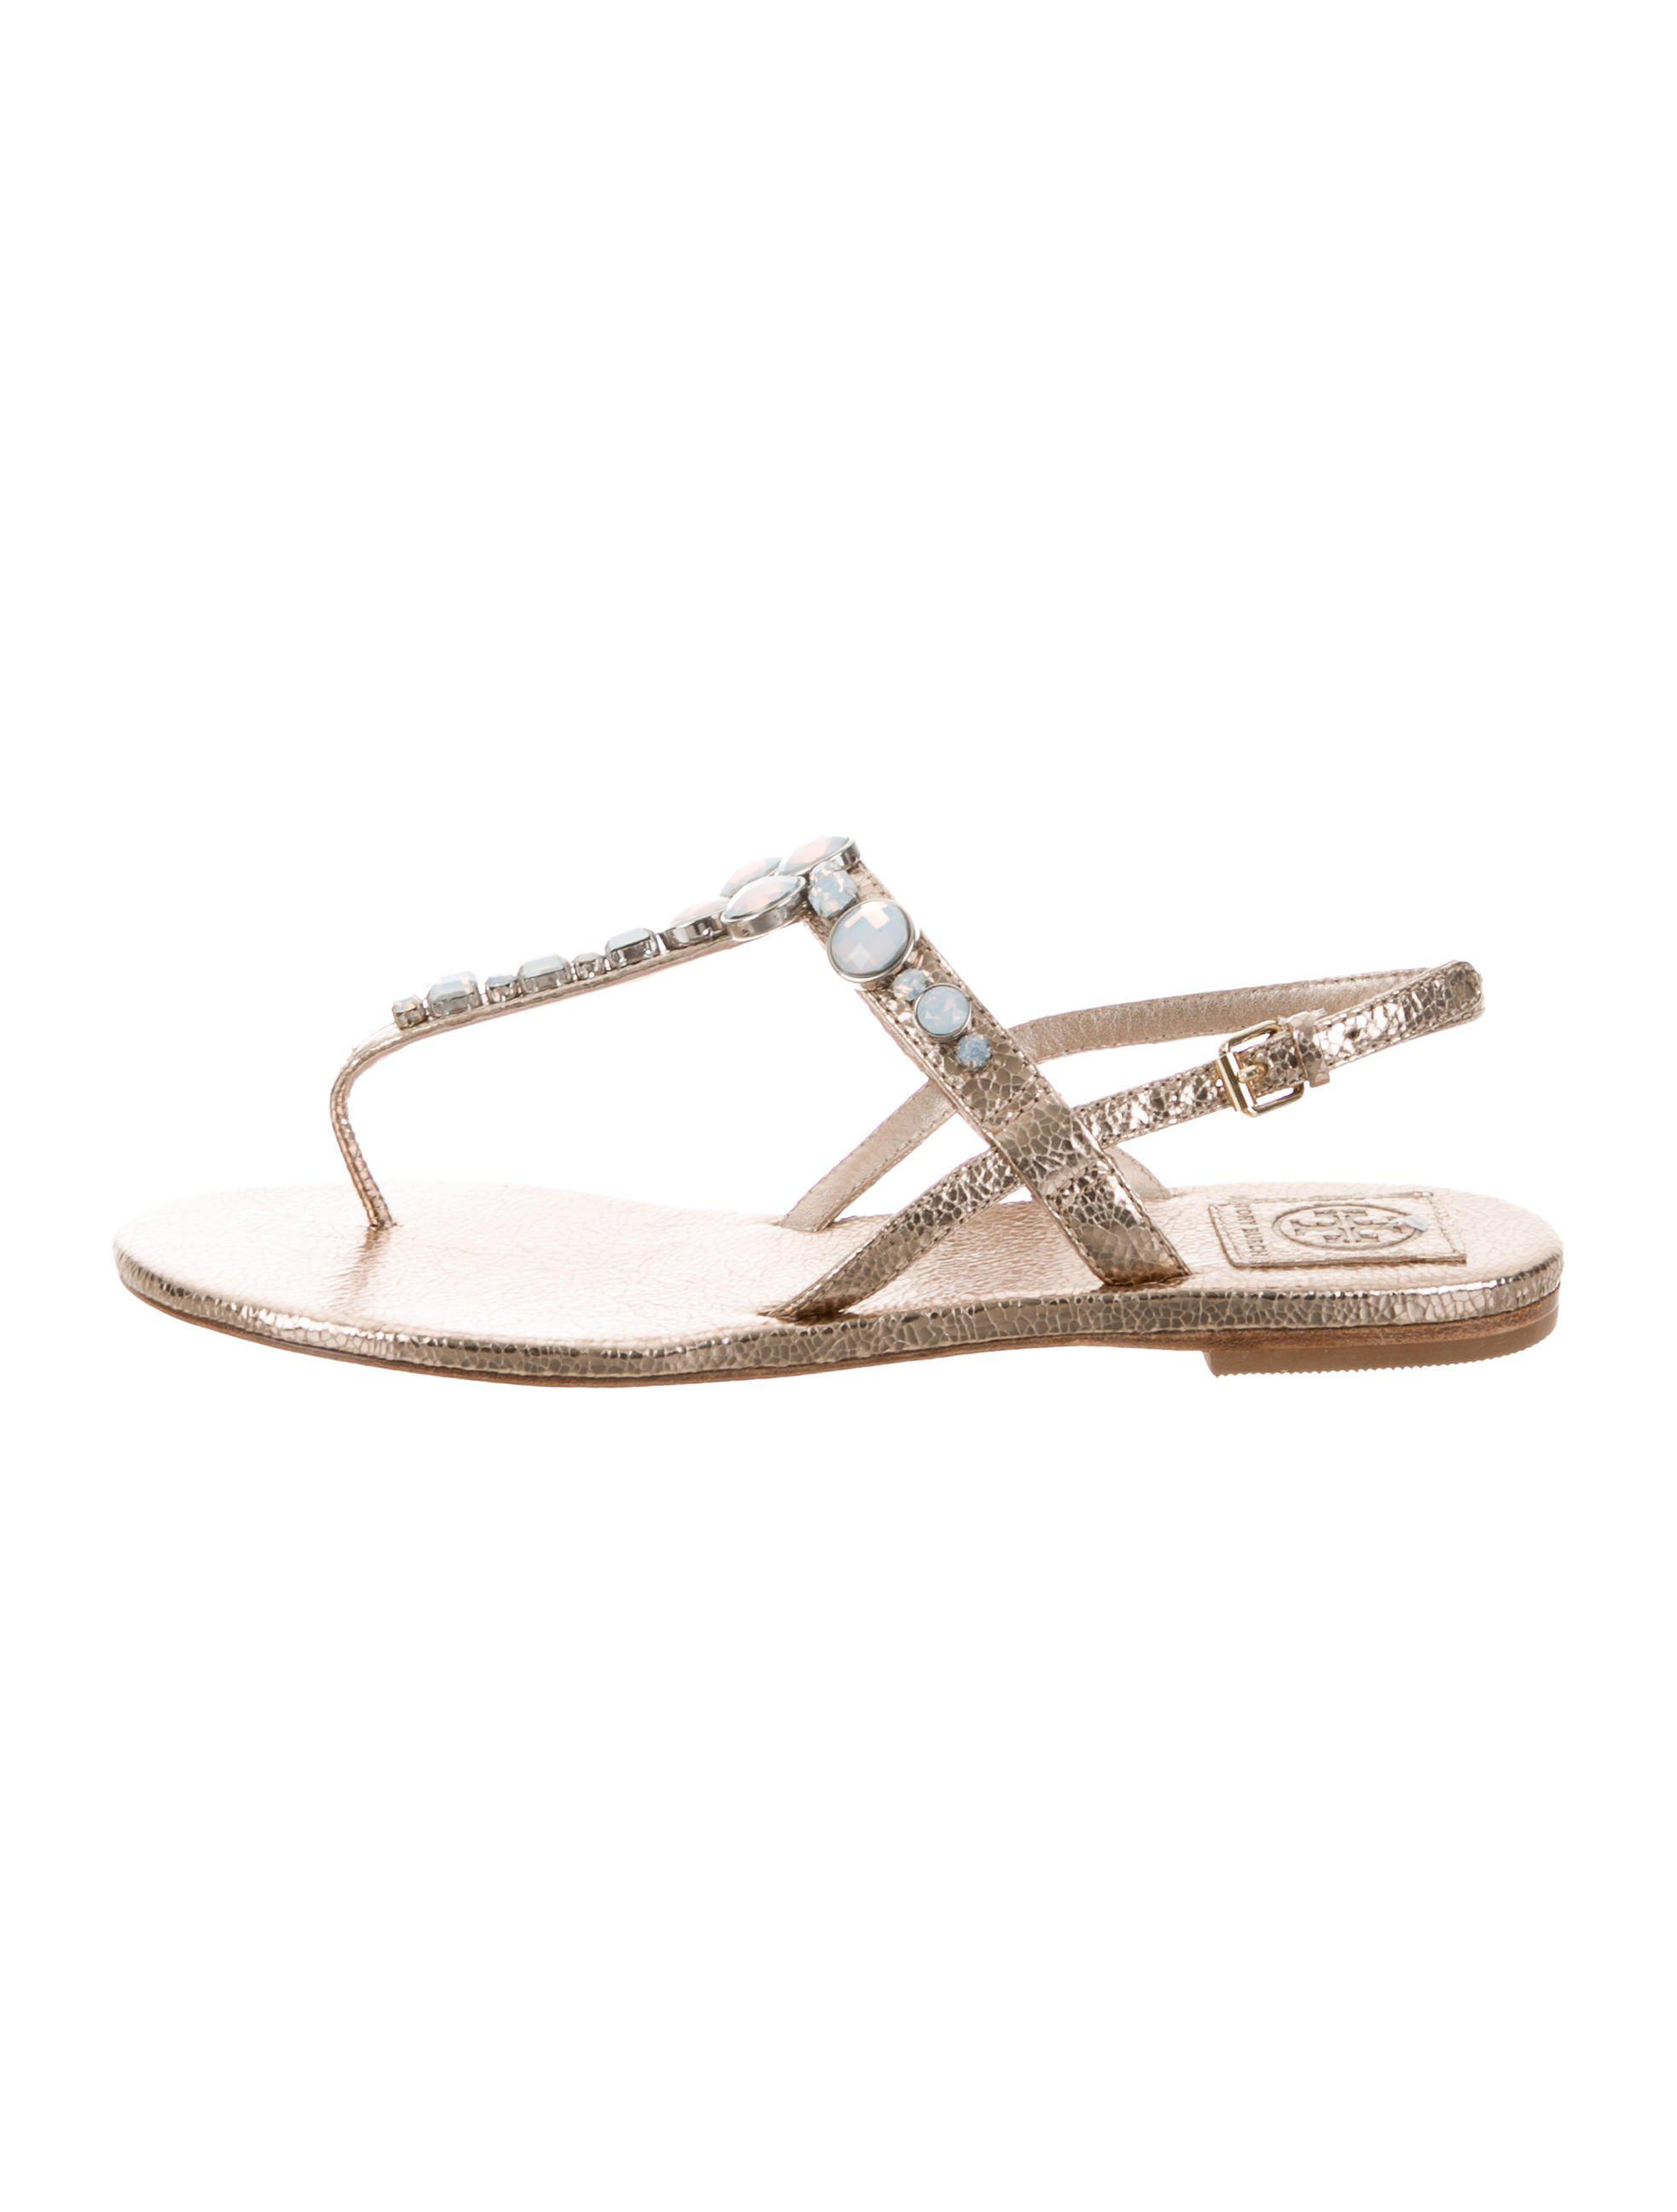 cb549f2b053db Lyst - Tory Burch Adalynn Embellished Sandals W  Tags Gold in Metallic